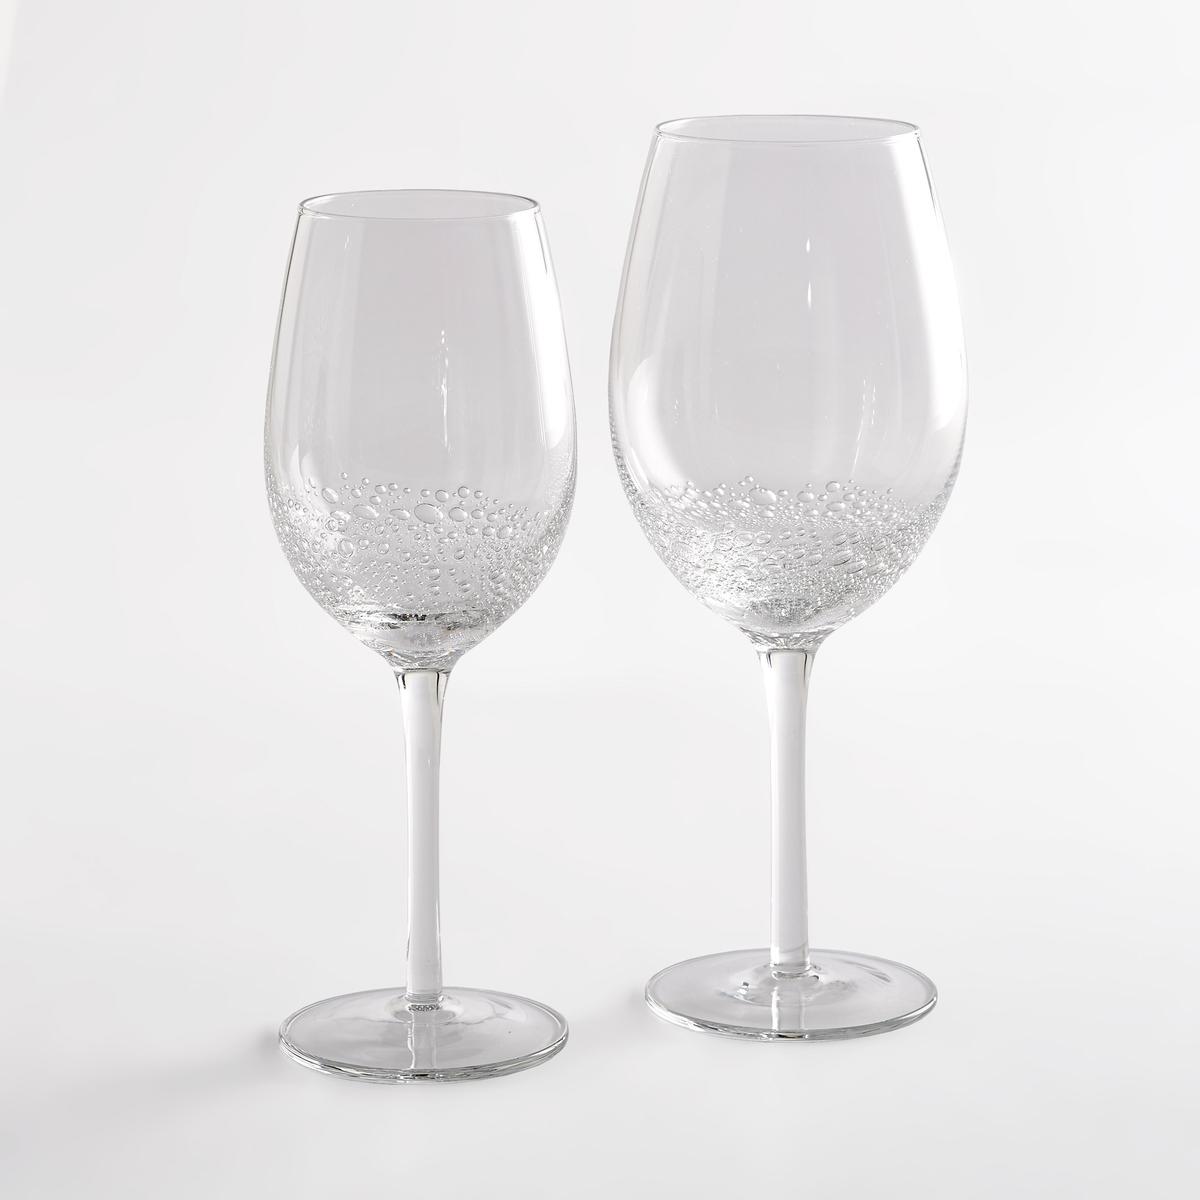 4 бокала под вино  GALIO 4 бокала под шампанское koutine